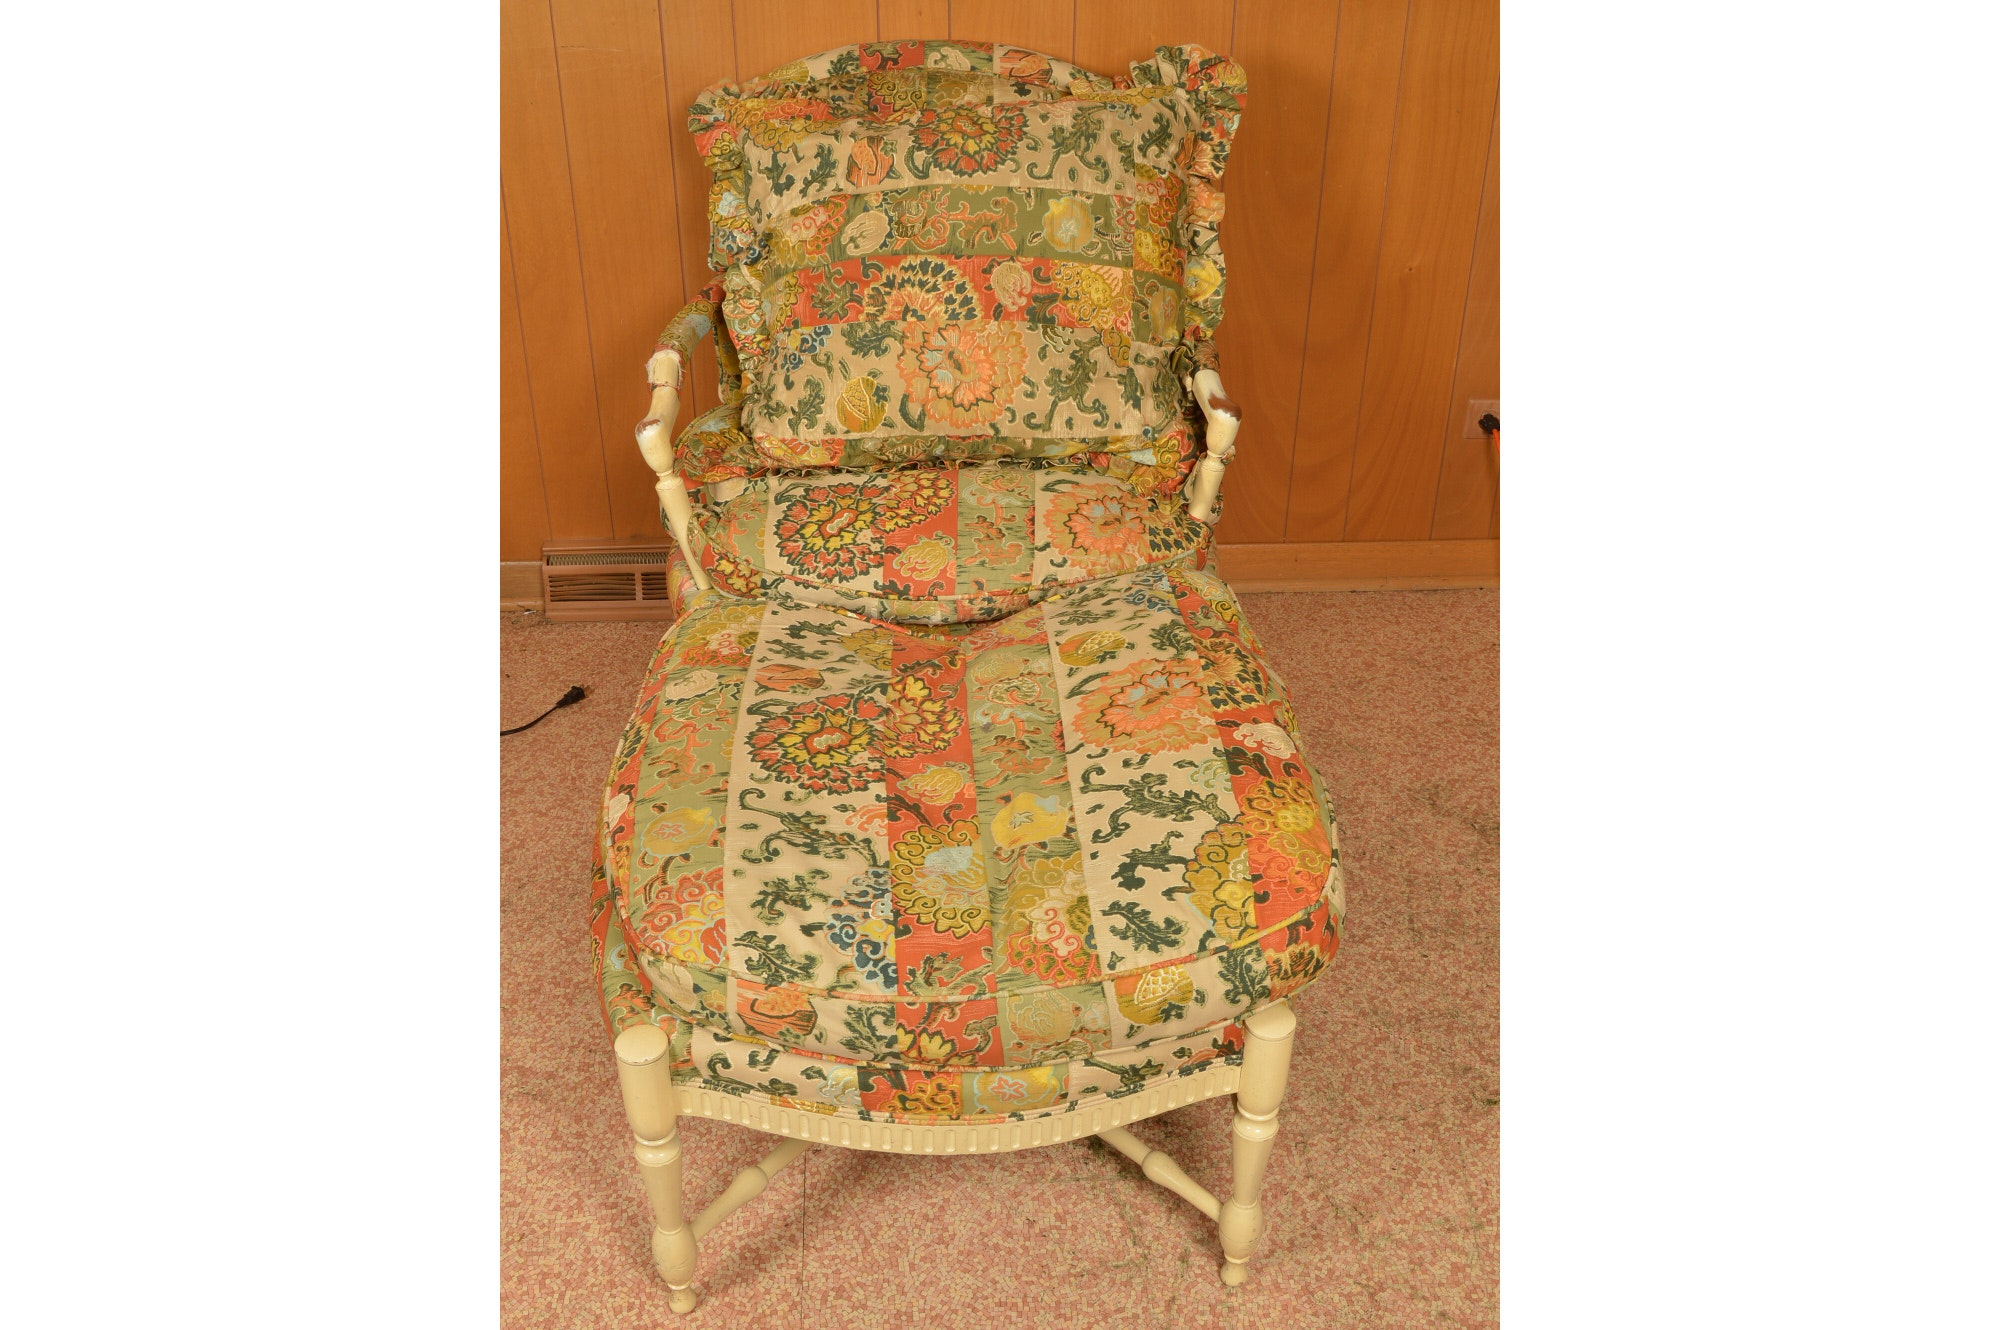 Vintage Armchair With Ottoman